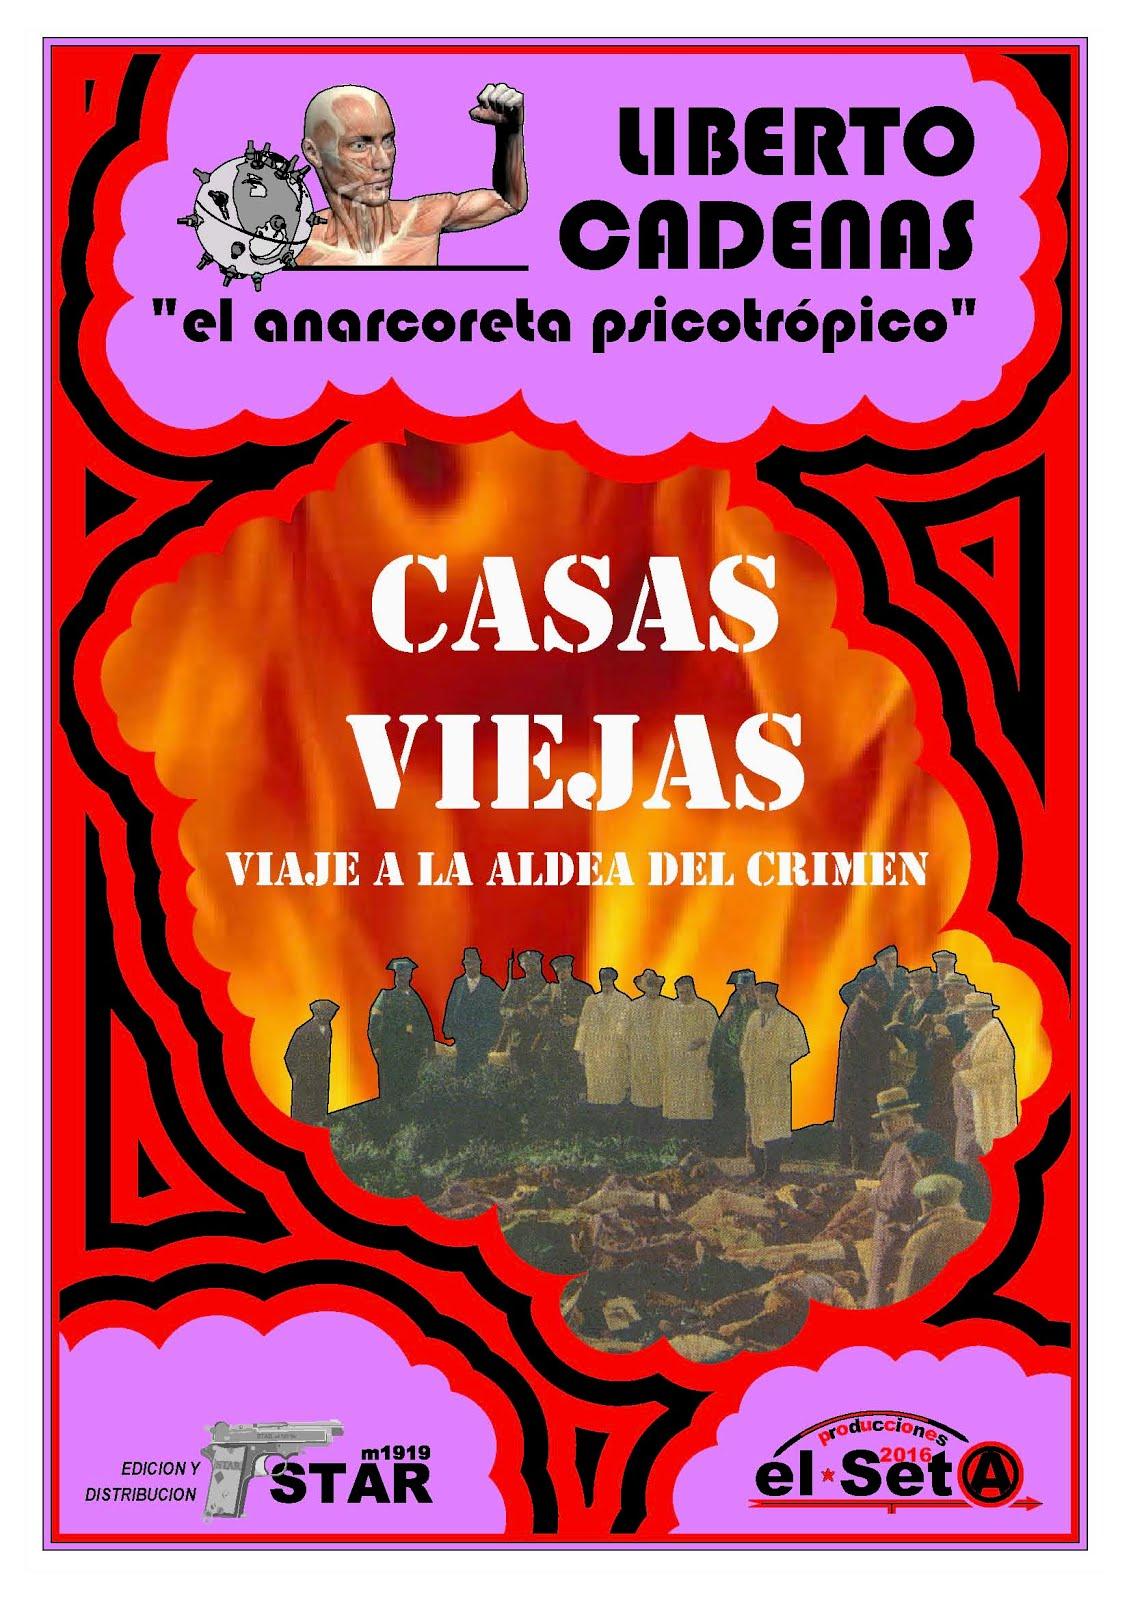 Liberto Cadenas - cap3